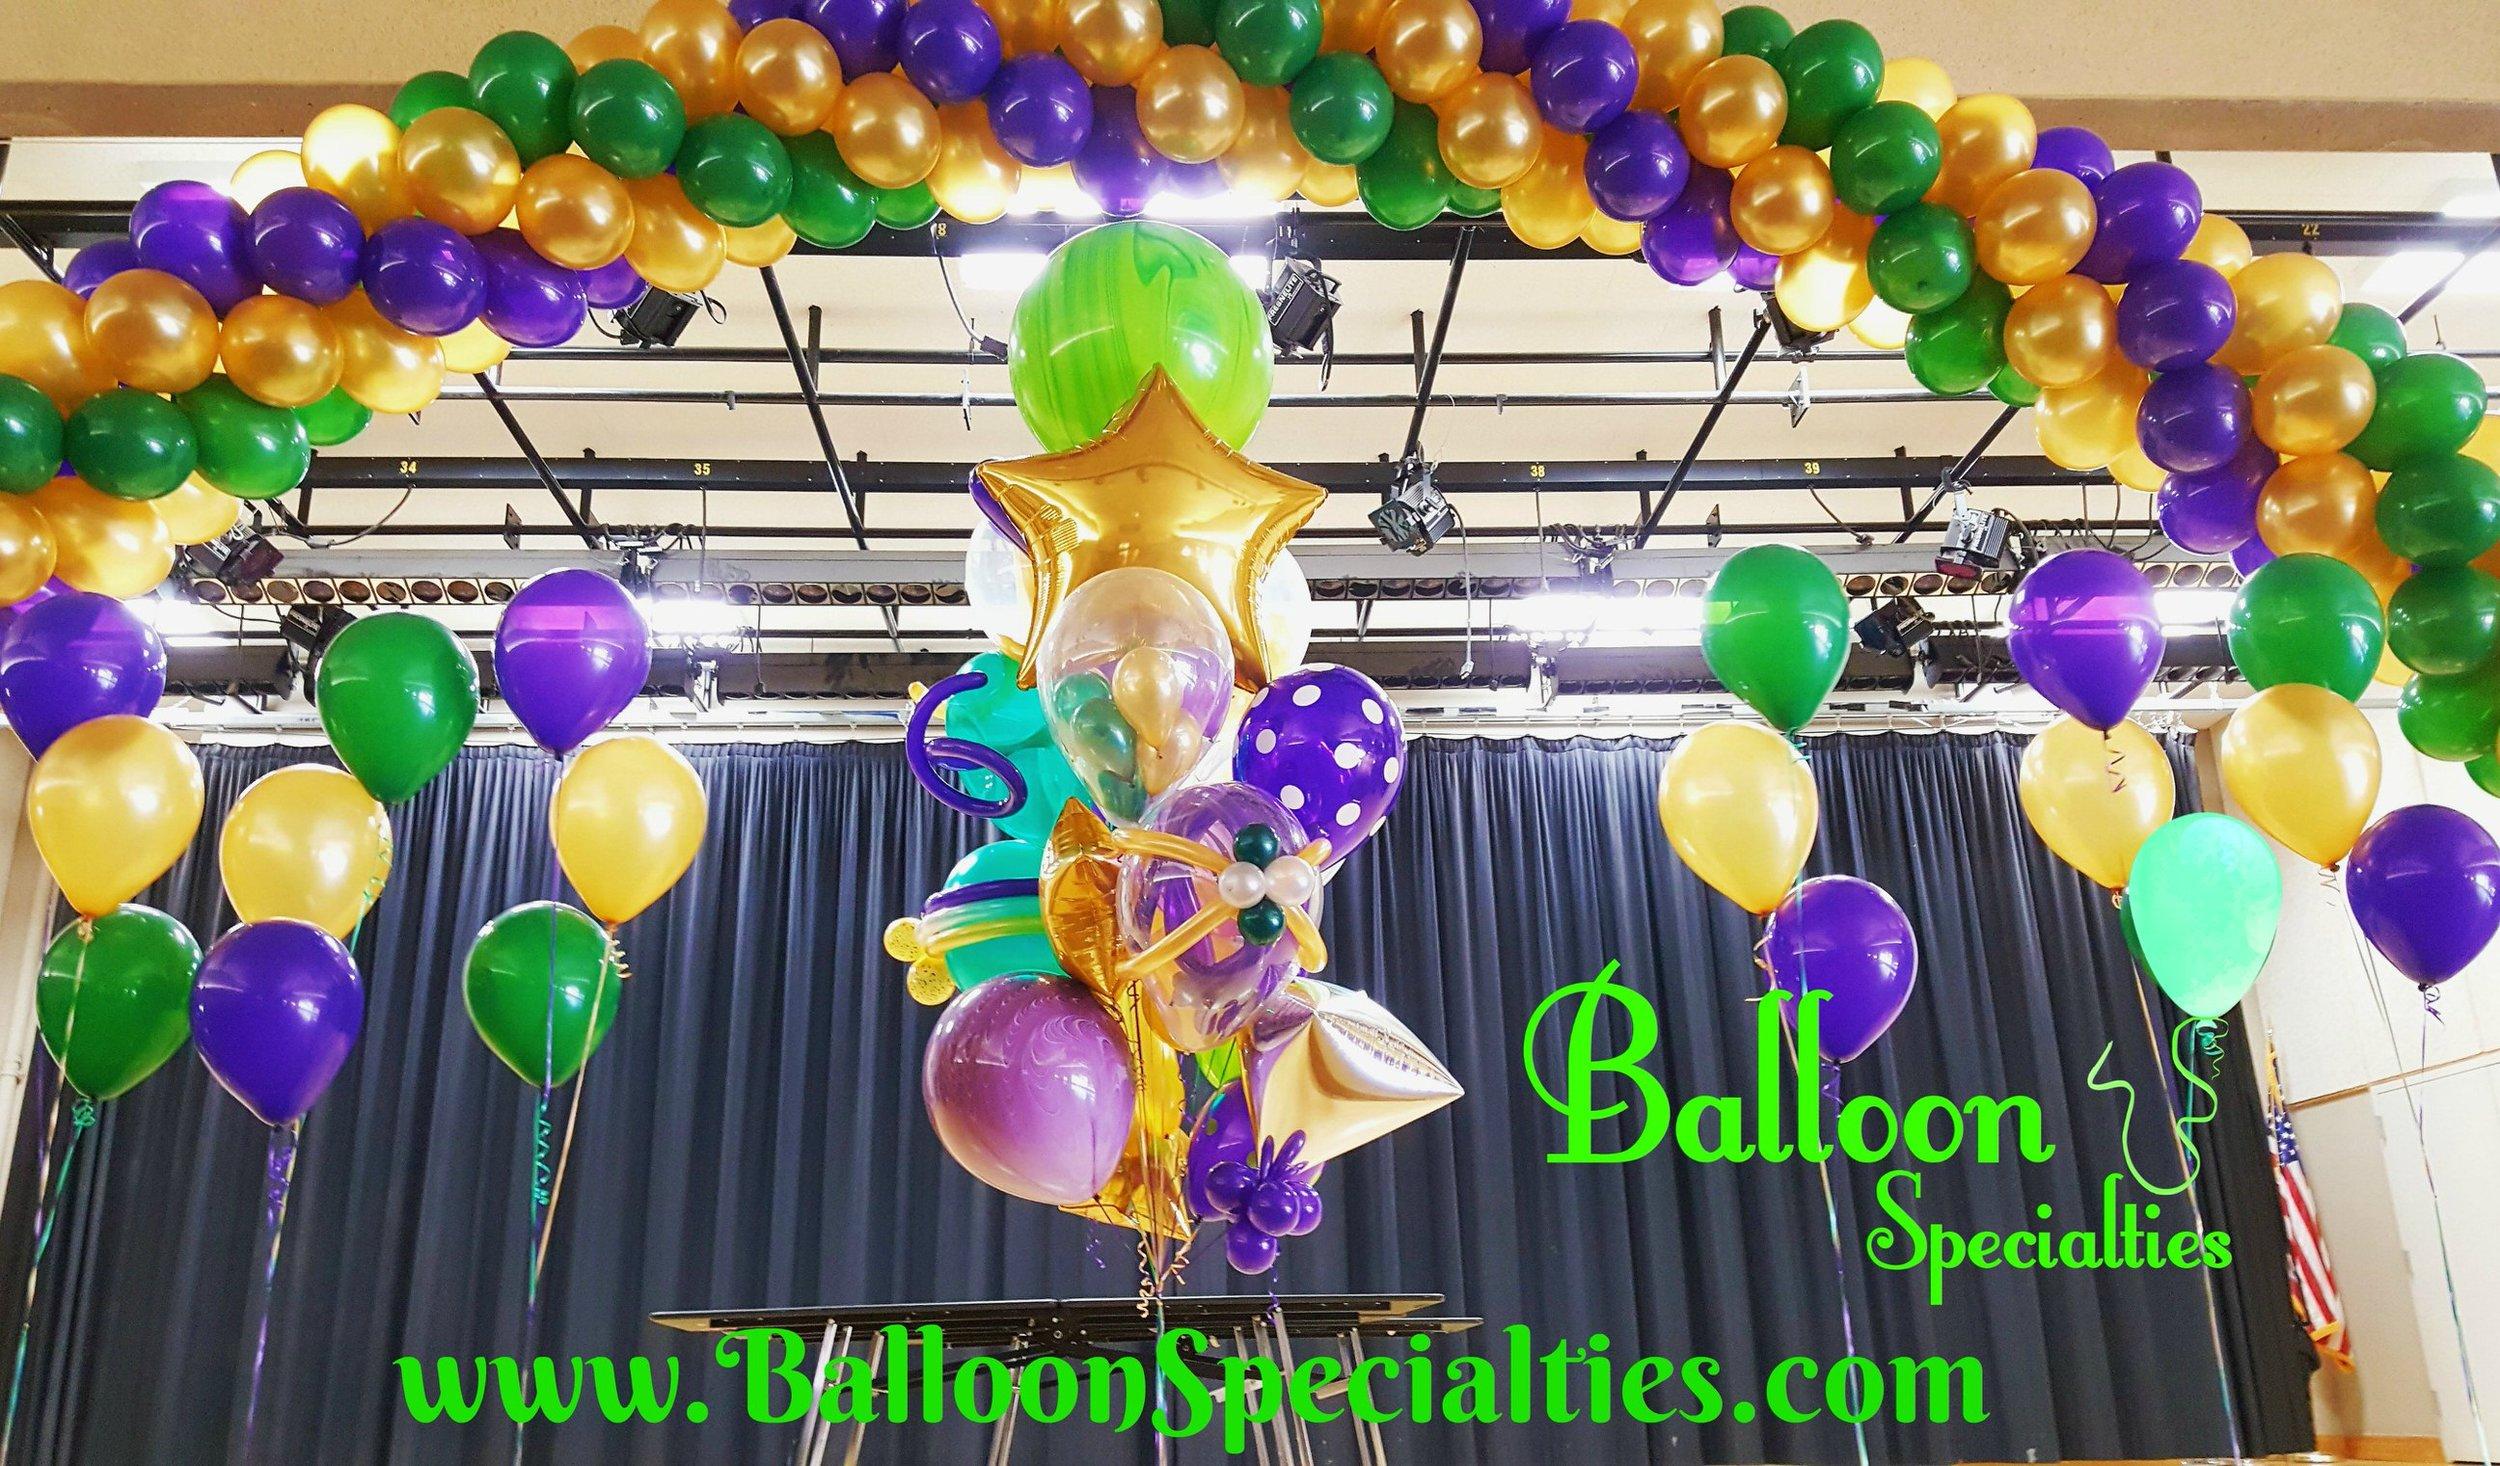 Mardi Gras Balloon Specialties.jpg